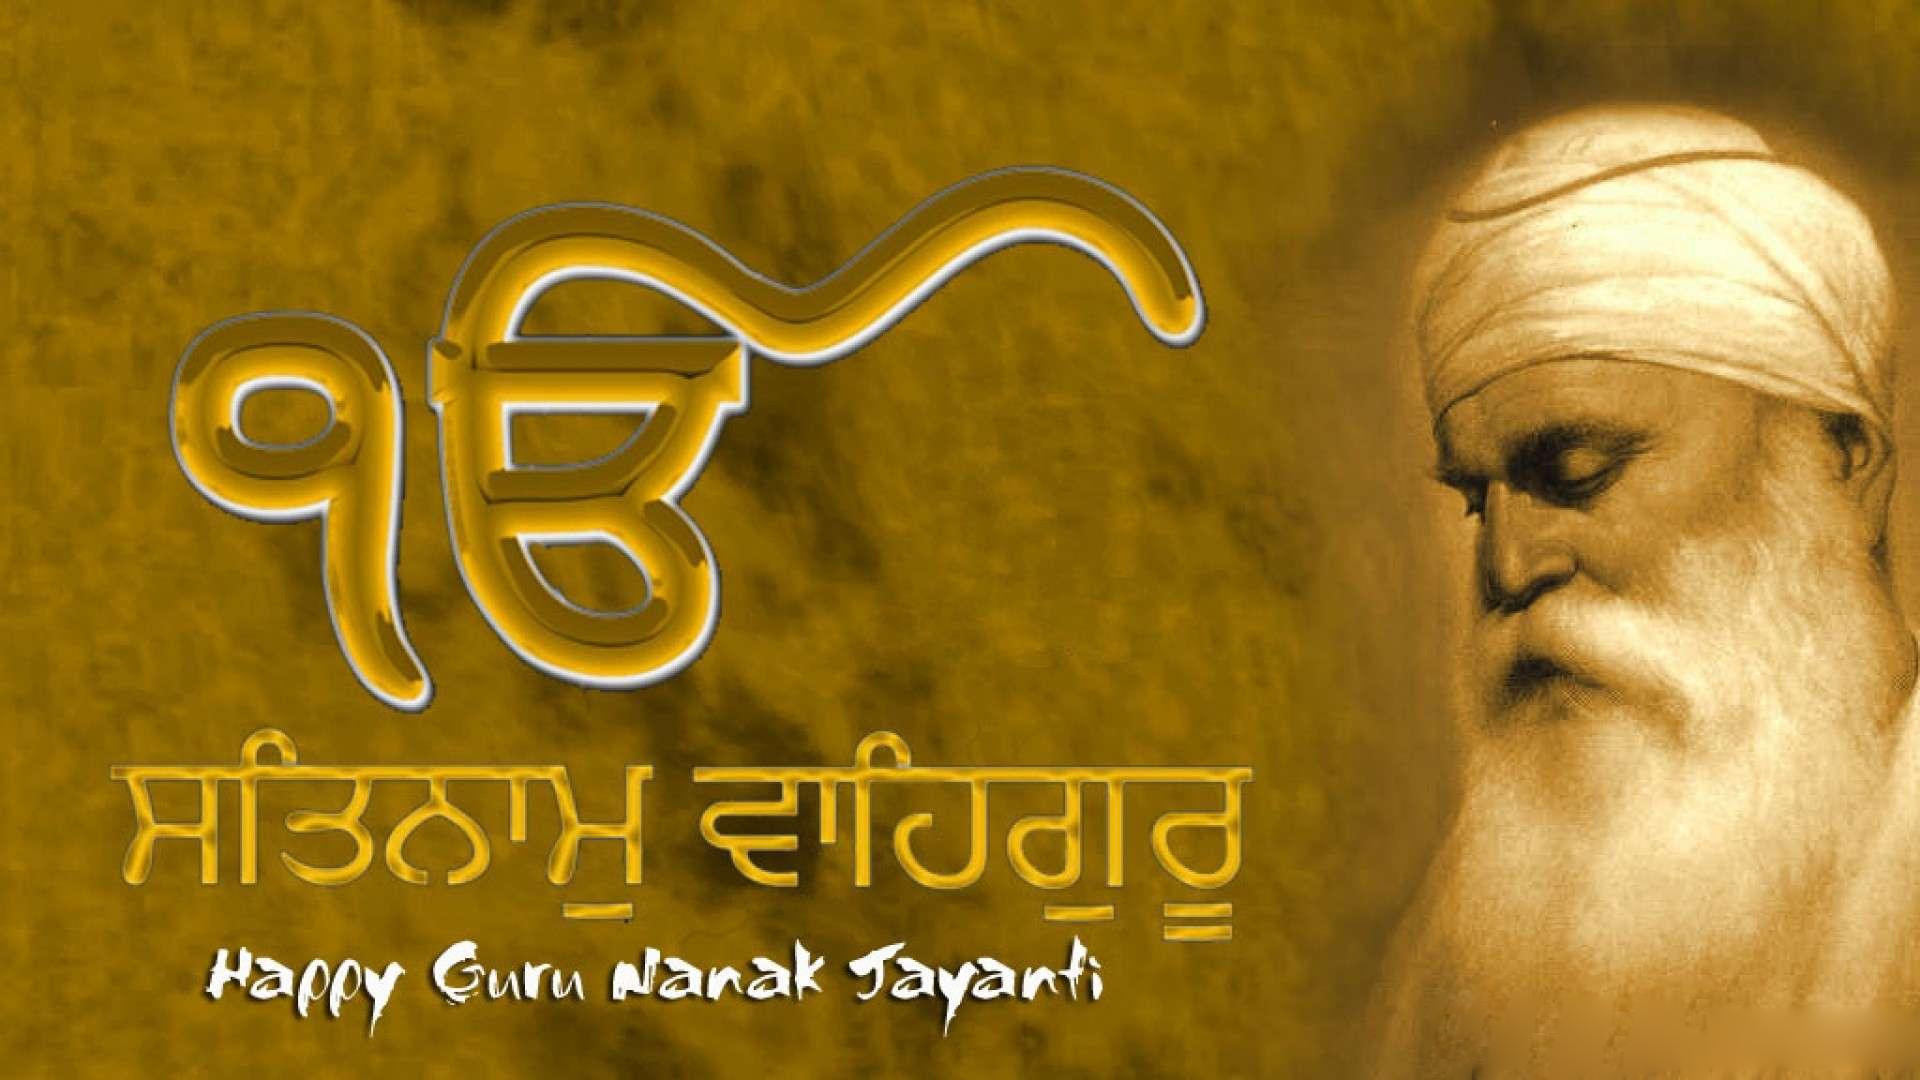 Guru Nanak Jayanti Wallpapers